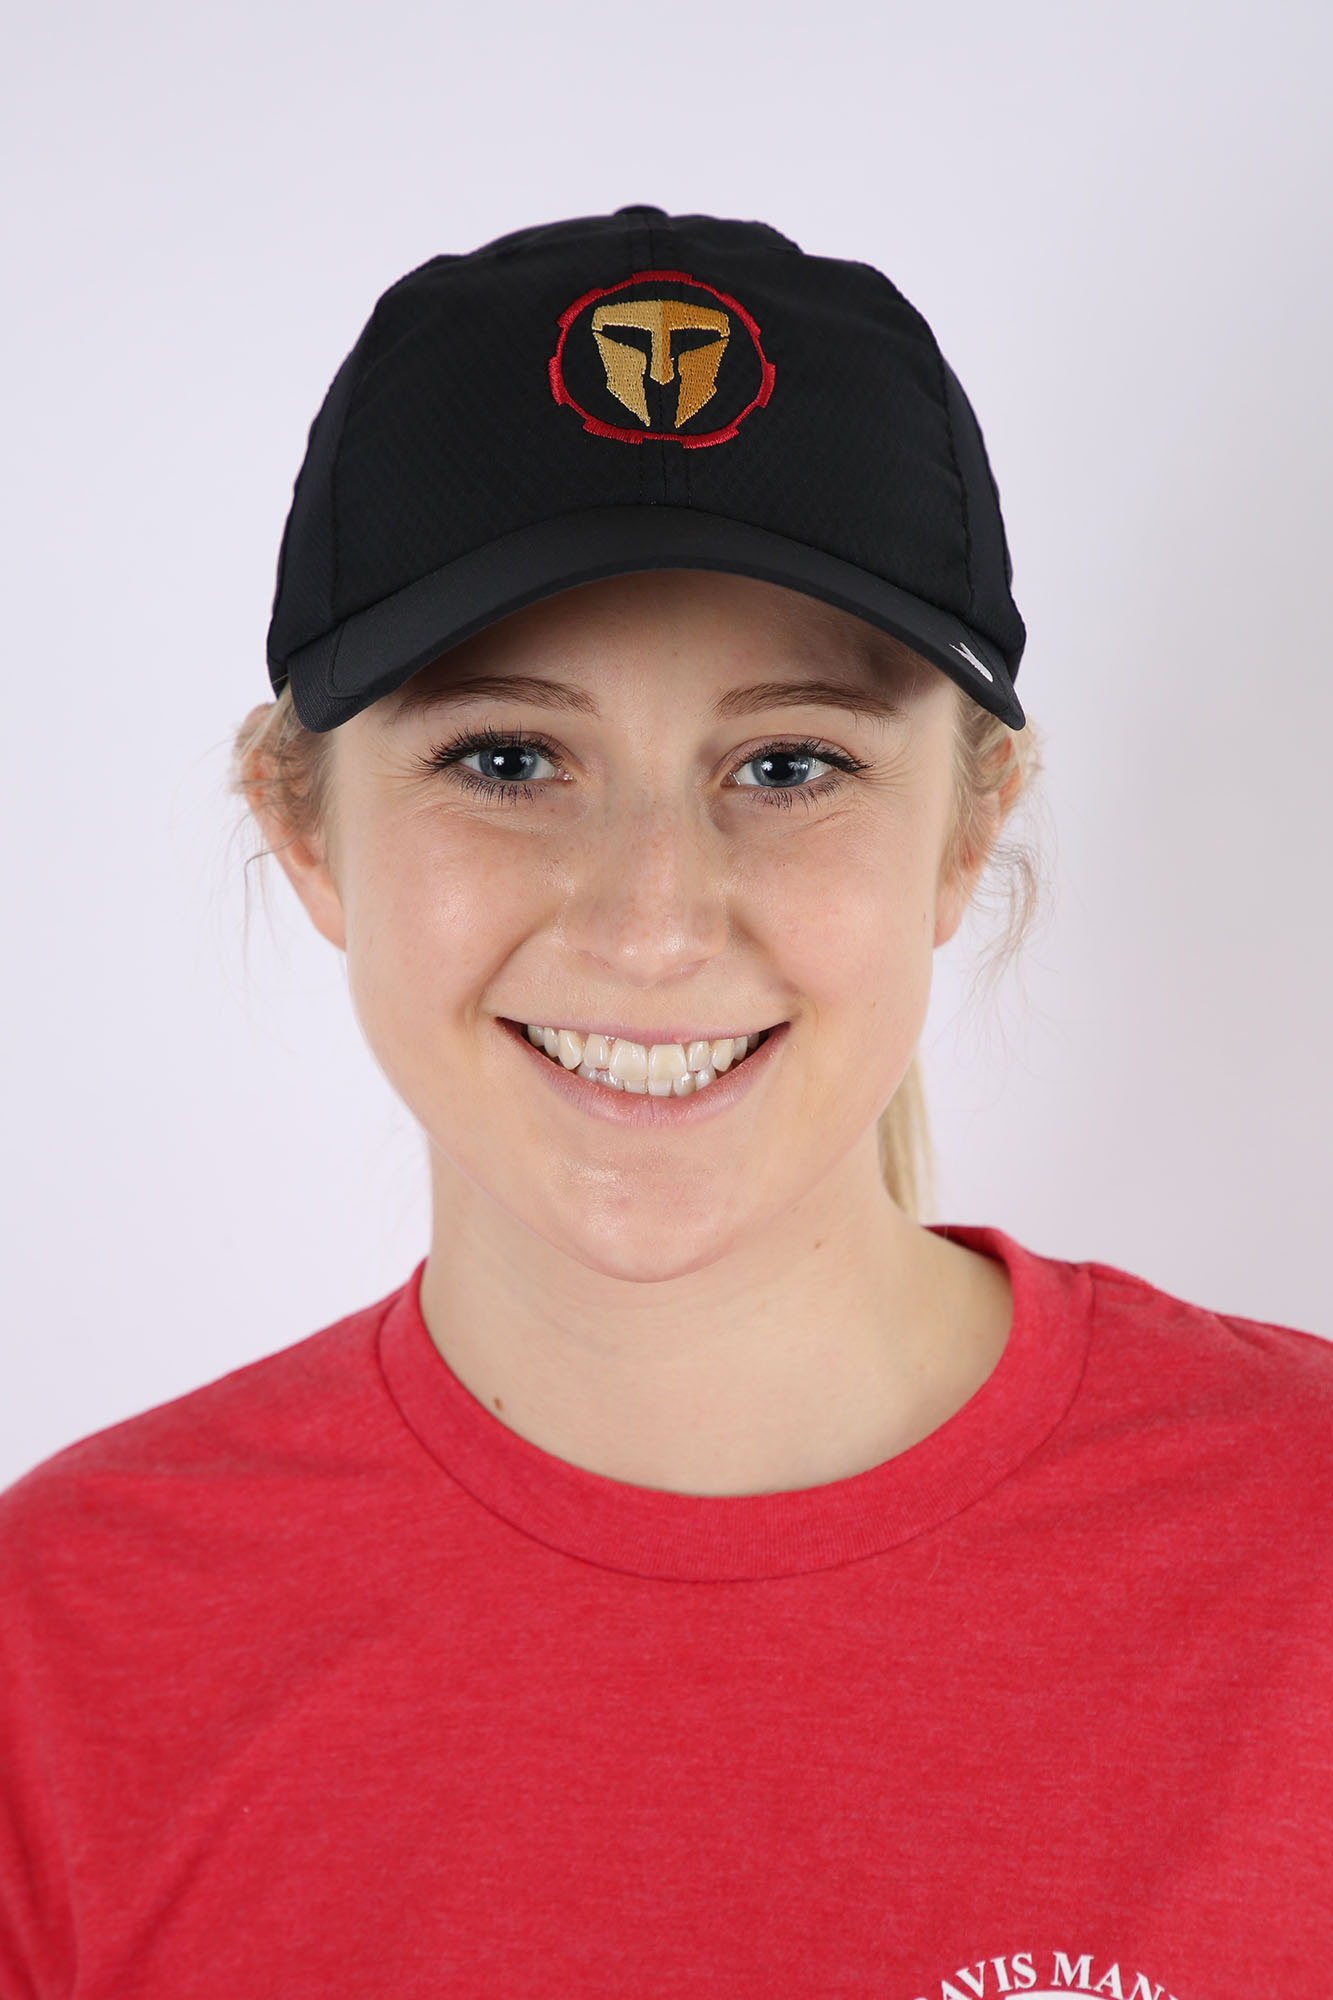 Travis Manion Foundation Unisex Nike Running Hat